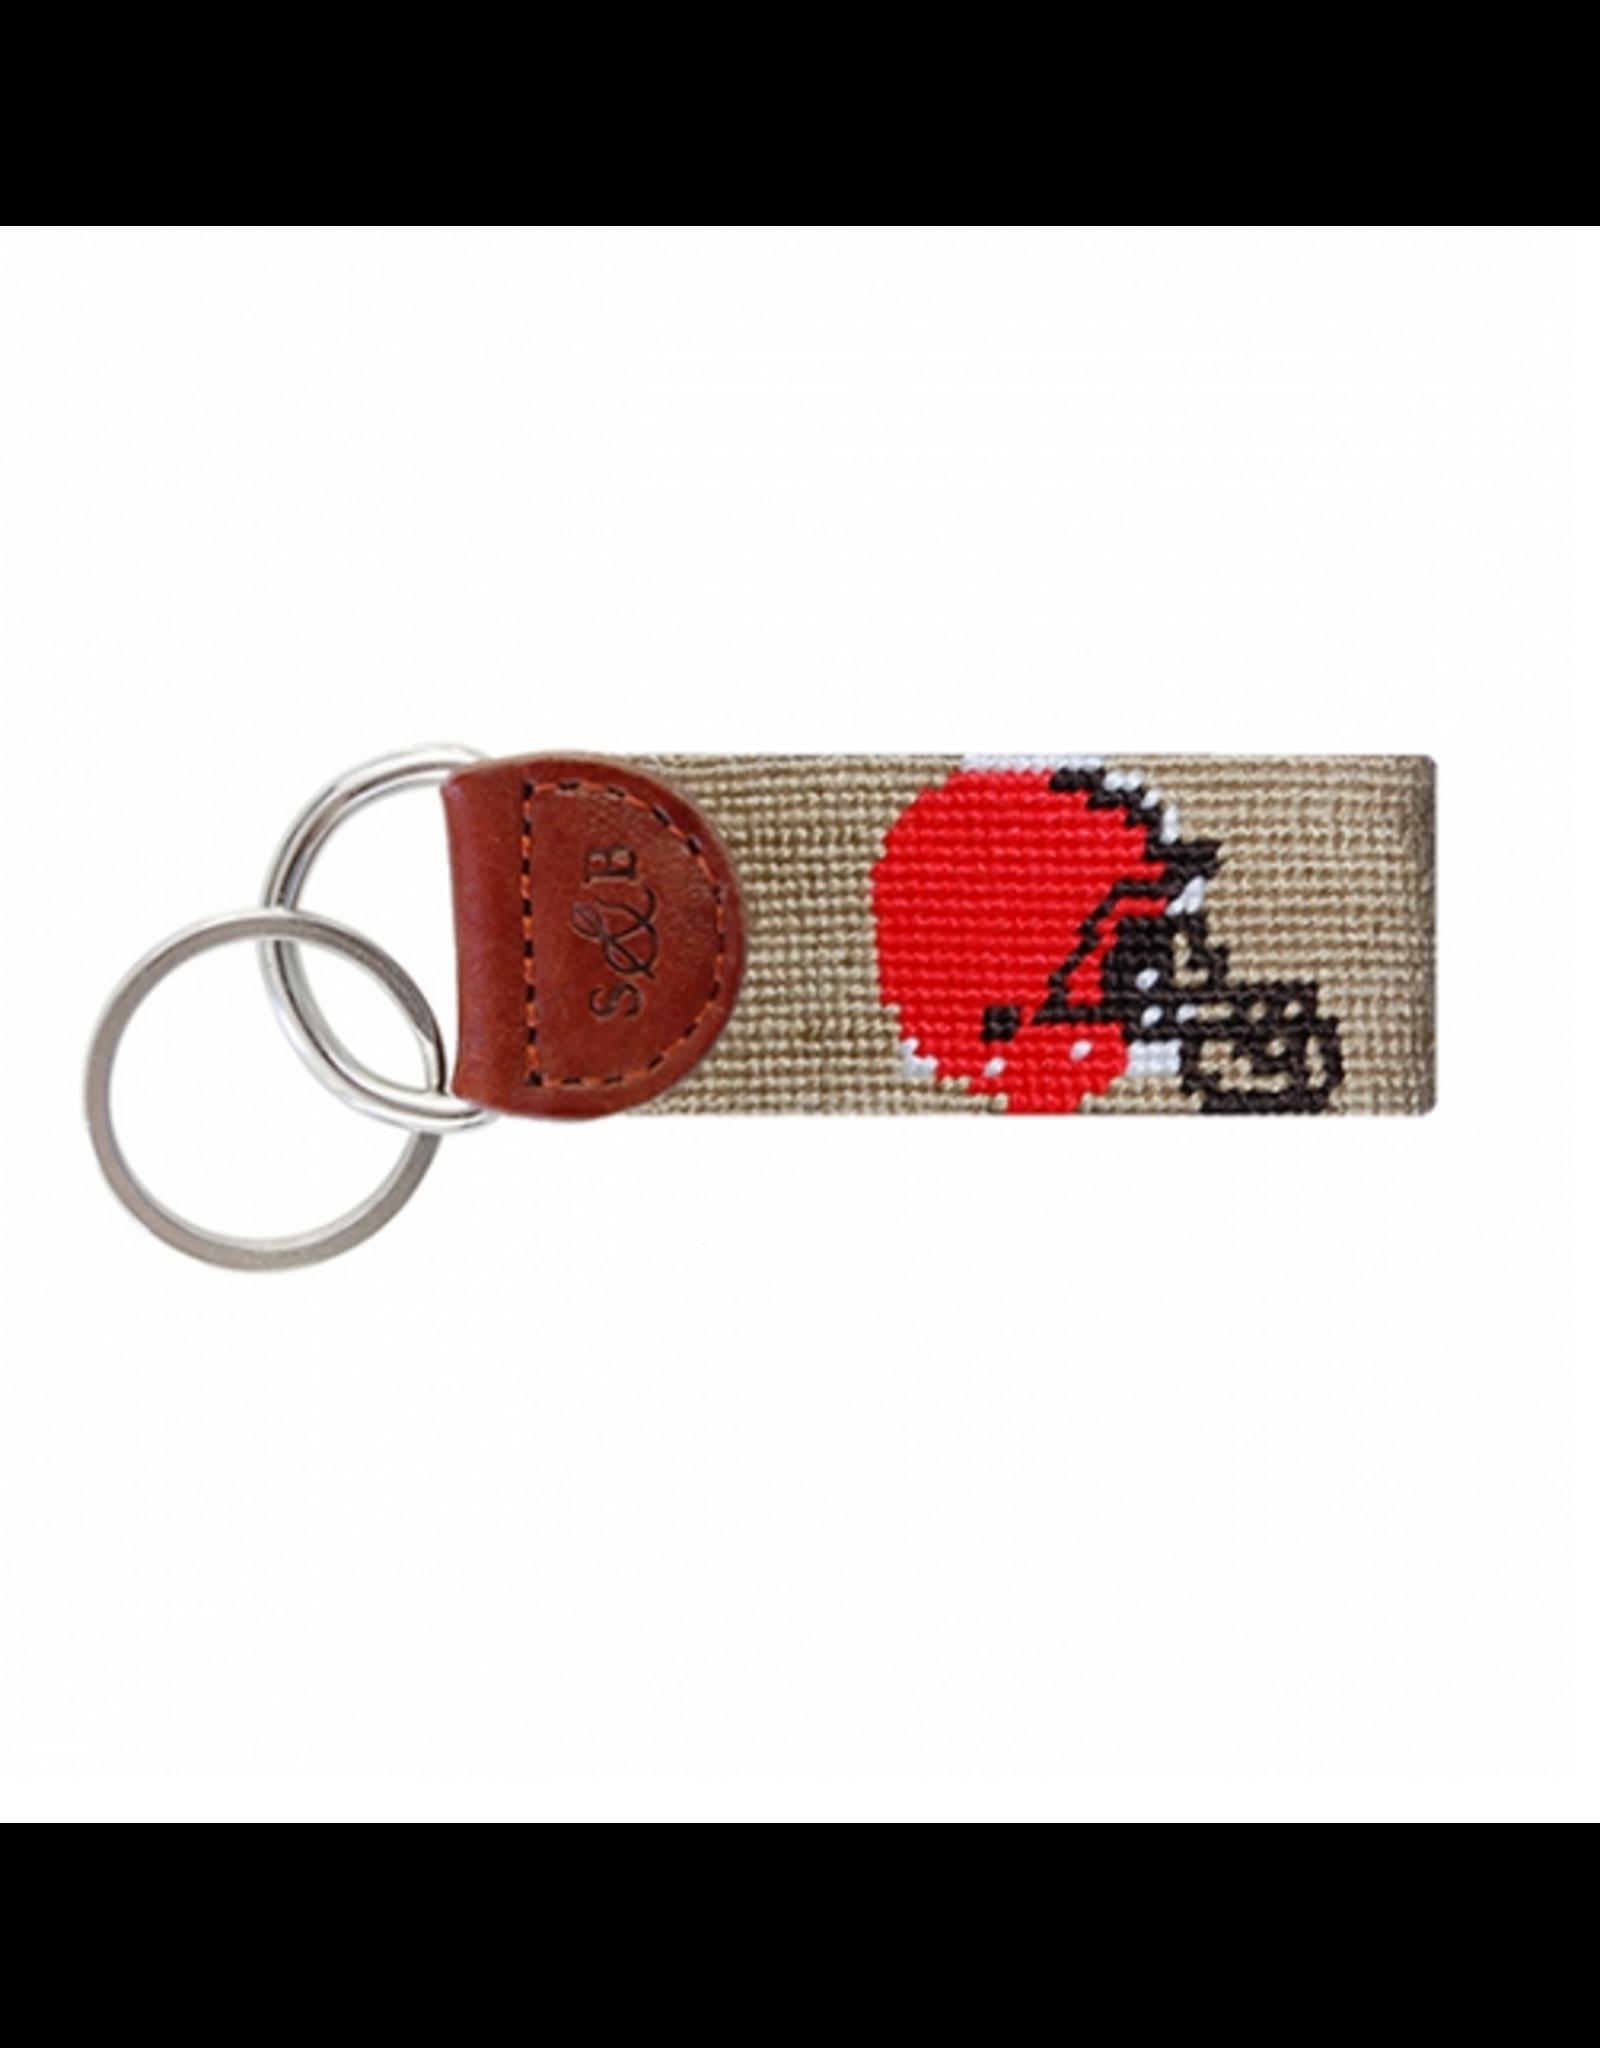 Smathers & Branson S&B Needlepoint Key Fob, Cleveland Browns